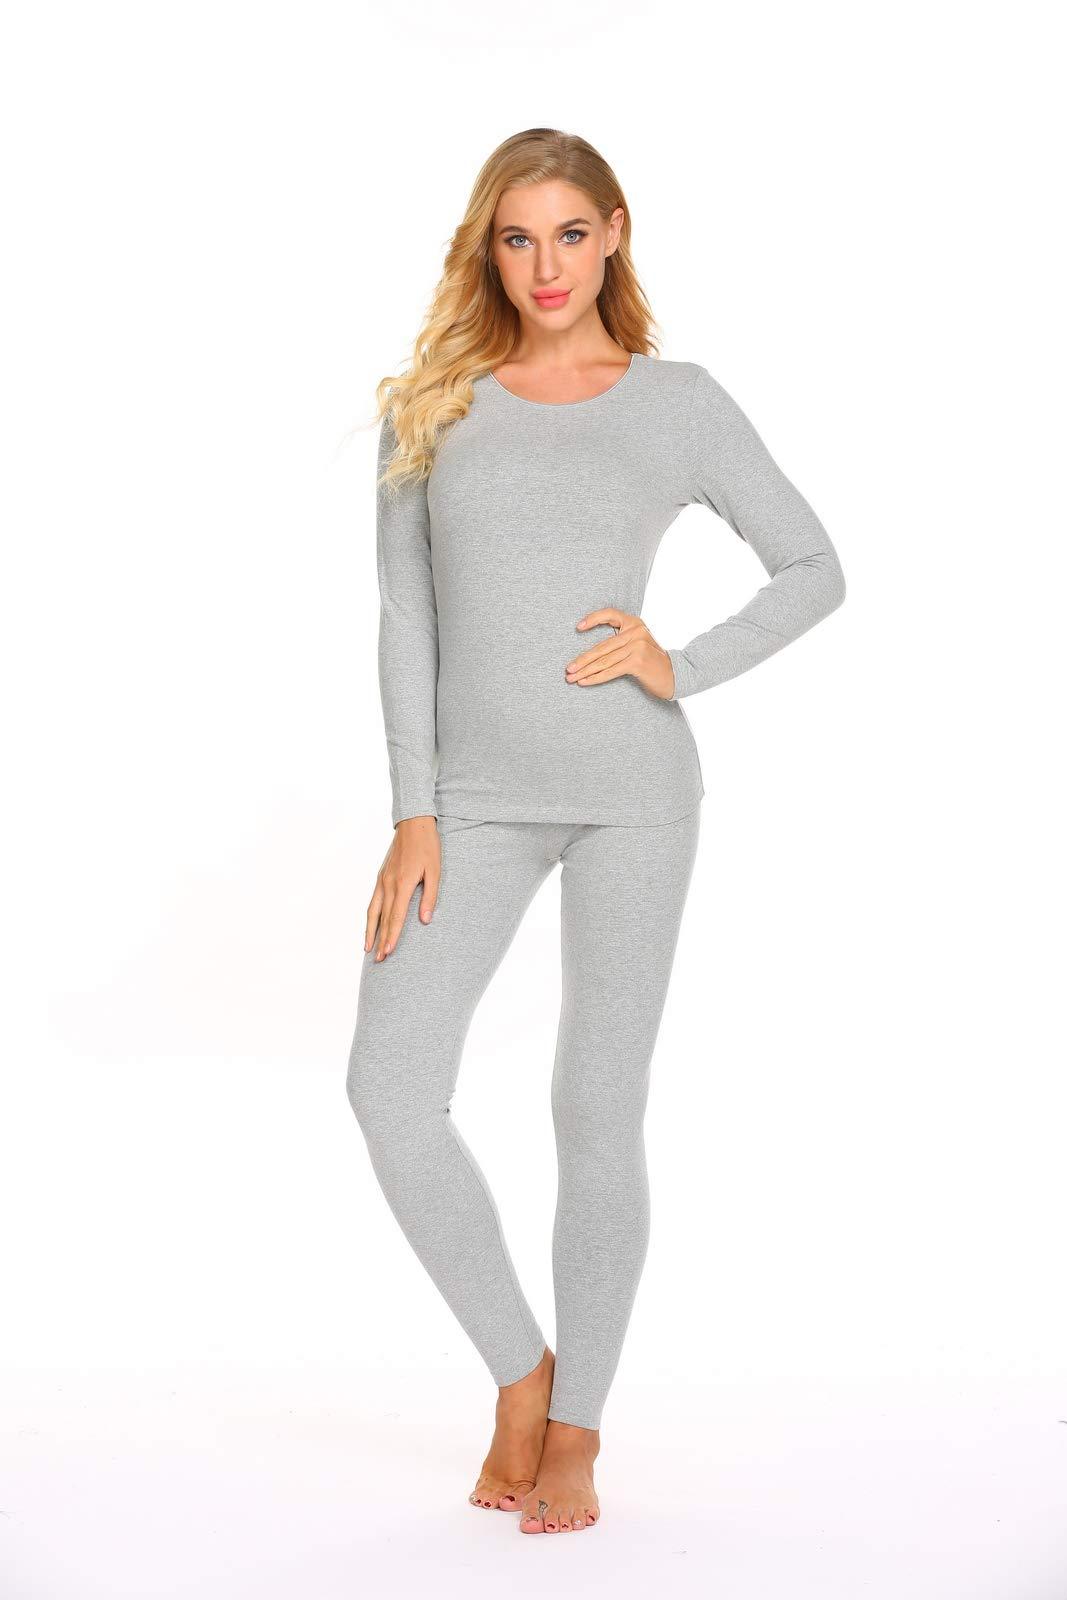 Ekouaer Thermal Underwear Women's Cotton Long Johns Set Scoop Neck Top & Bottom Pajama Winter Base Layering Set, Grey, Large